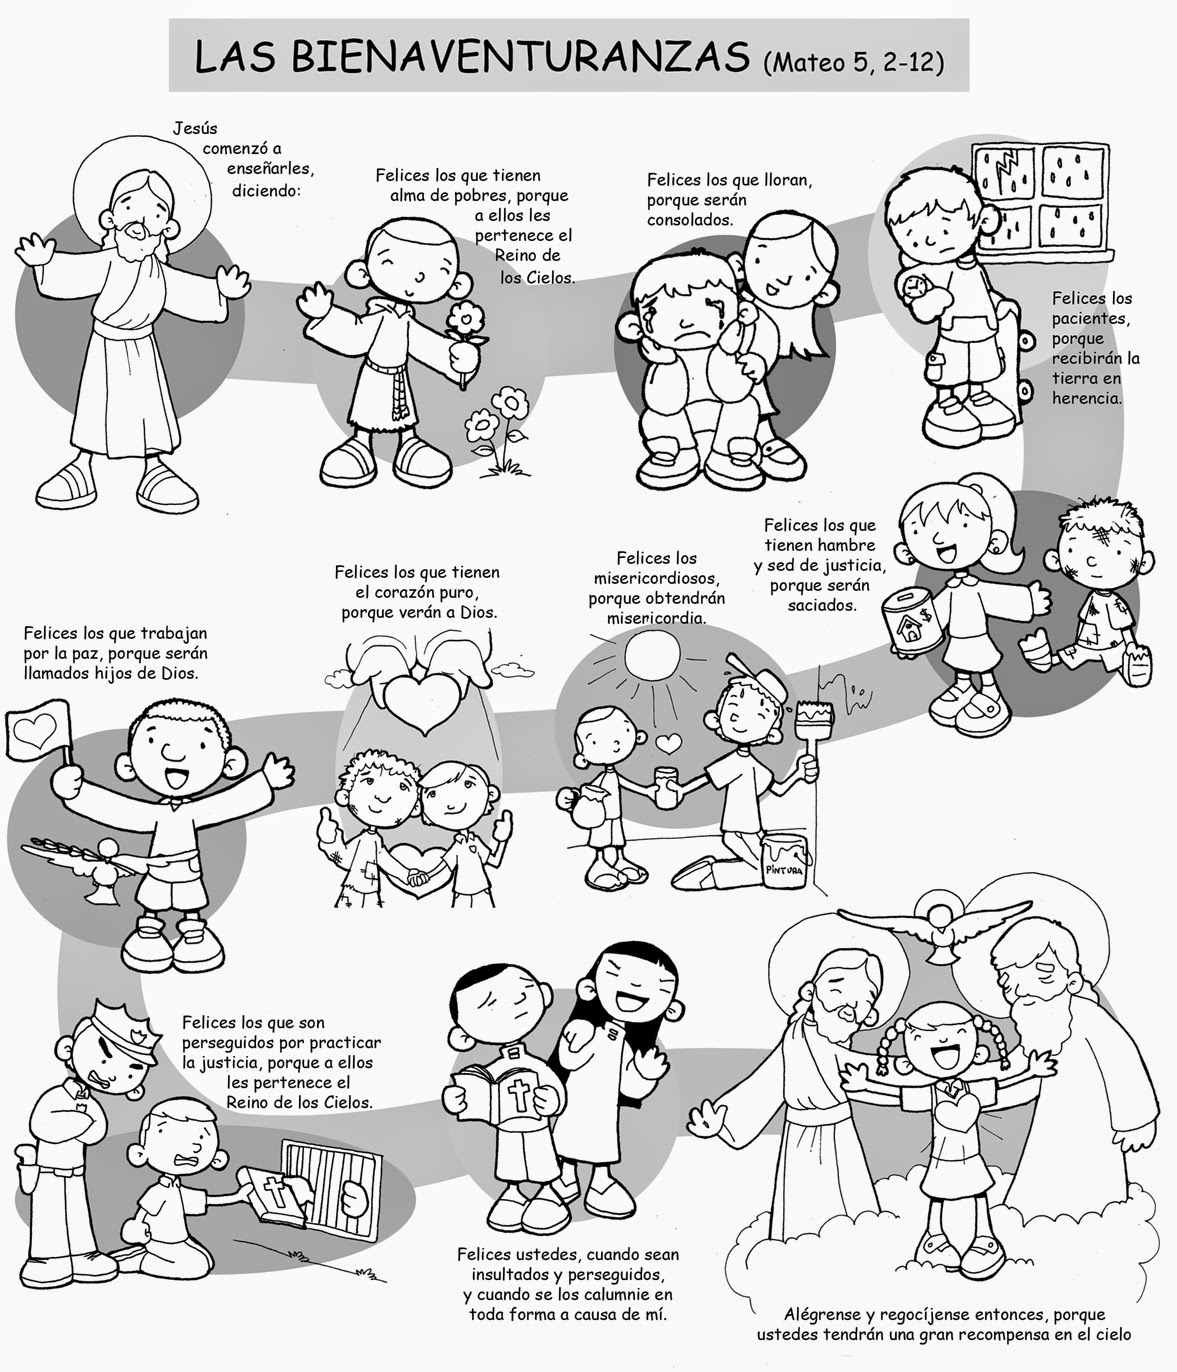 Dibujos Para Catequesis Las Bienaventuranzas Mateo 5 2 12